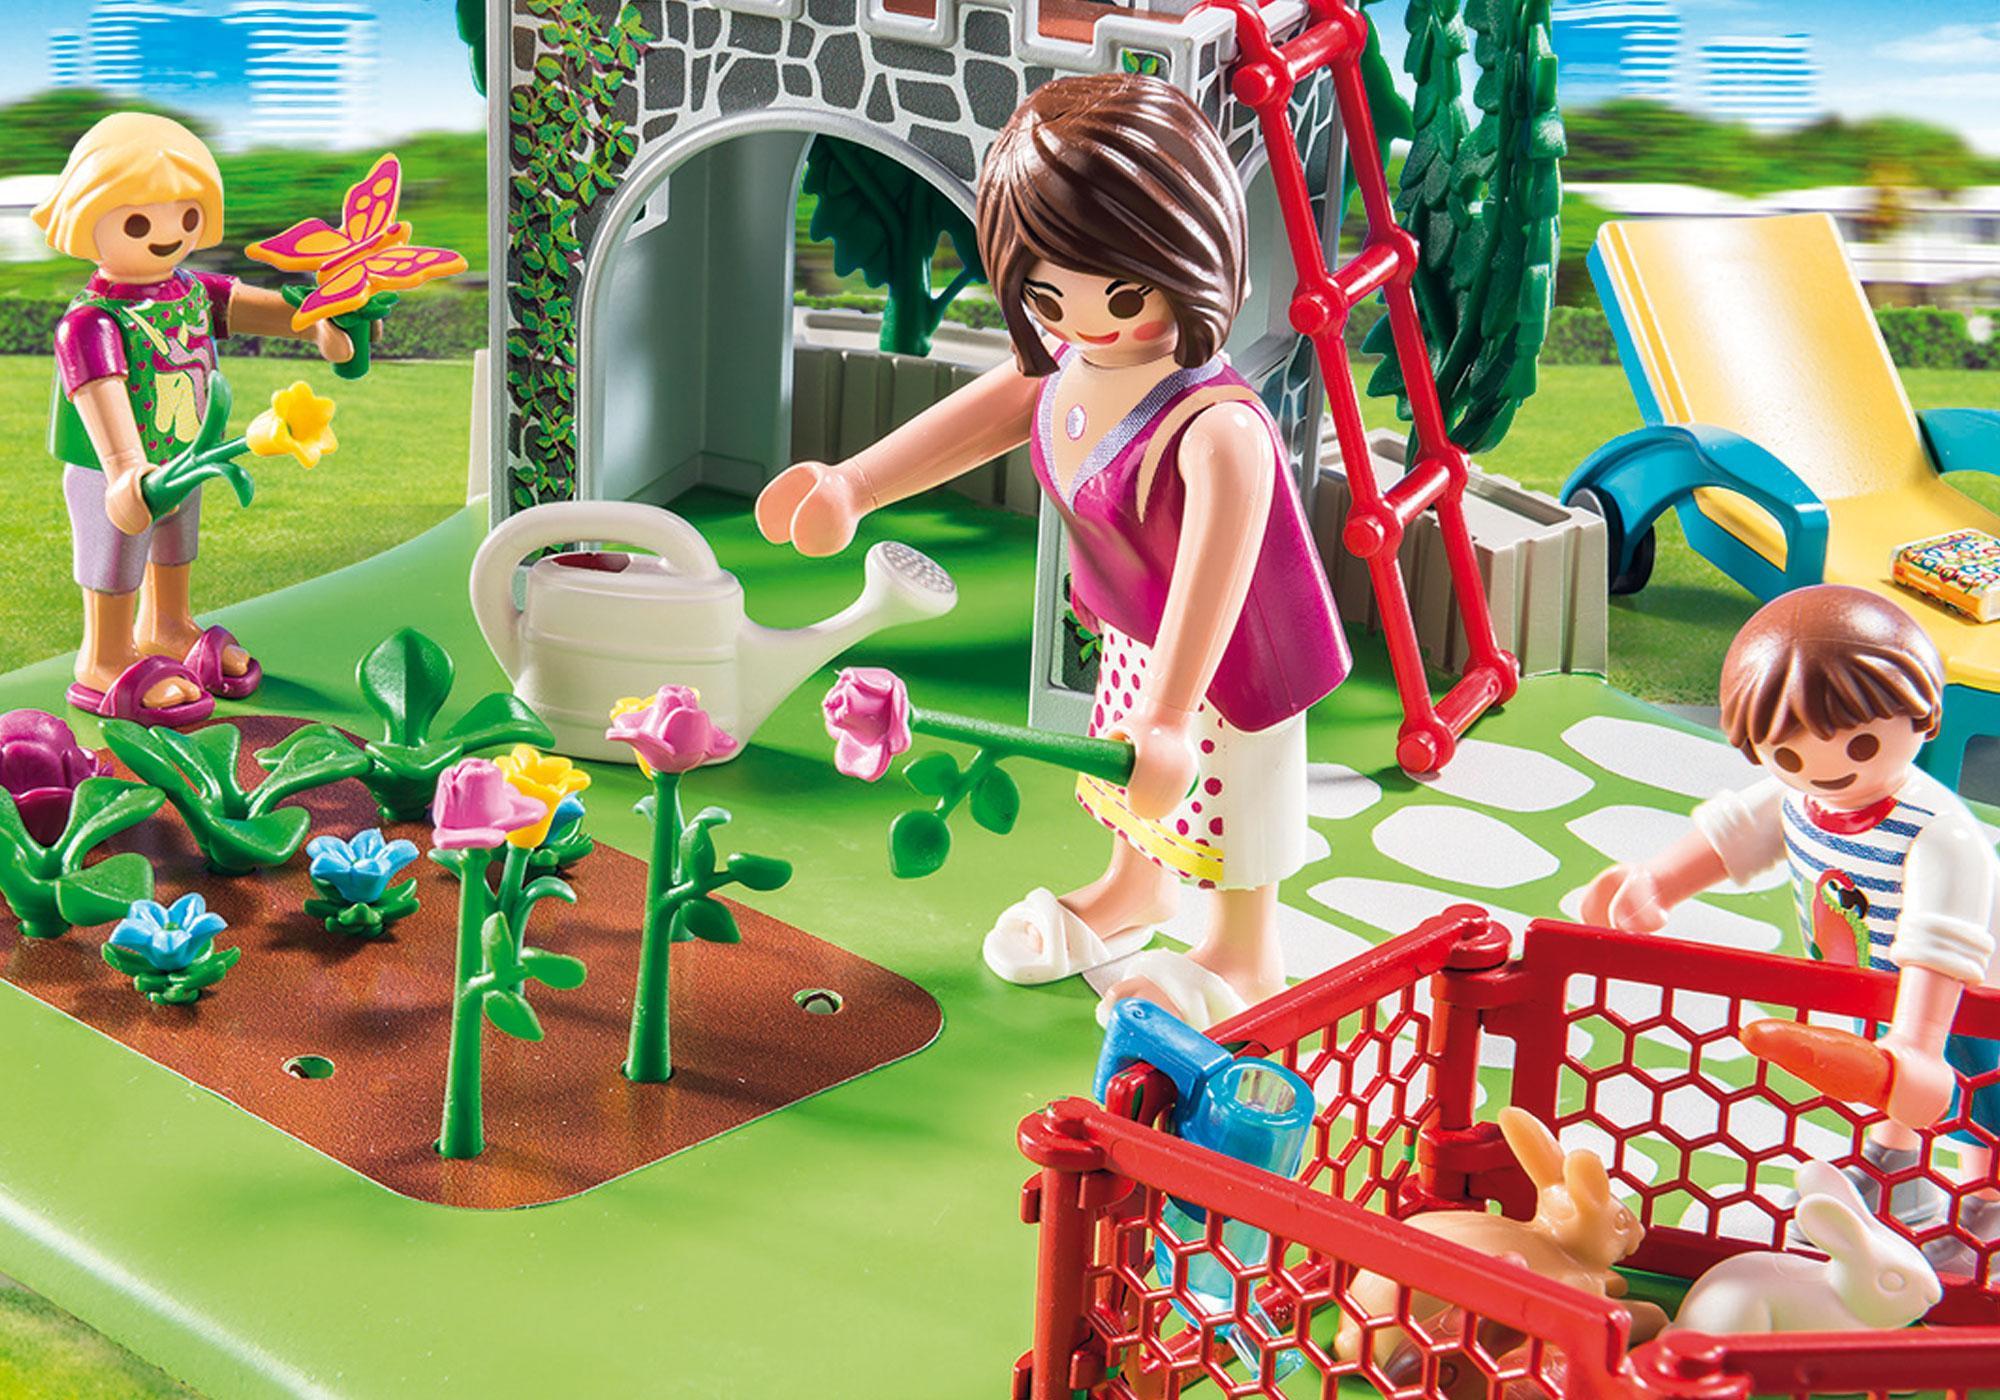 http://media.playmobil.com/i/playmobil/70010_product_extra1/SuperSet Familiengarten